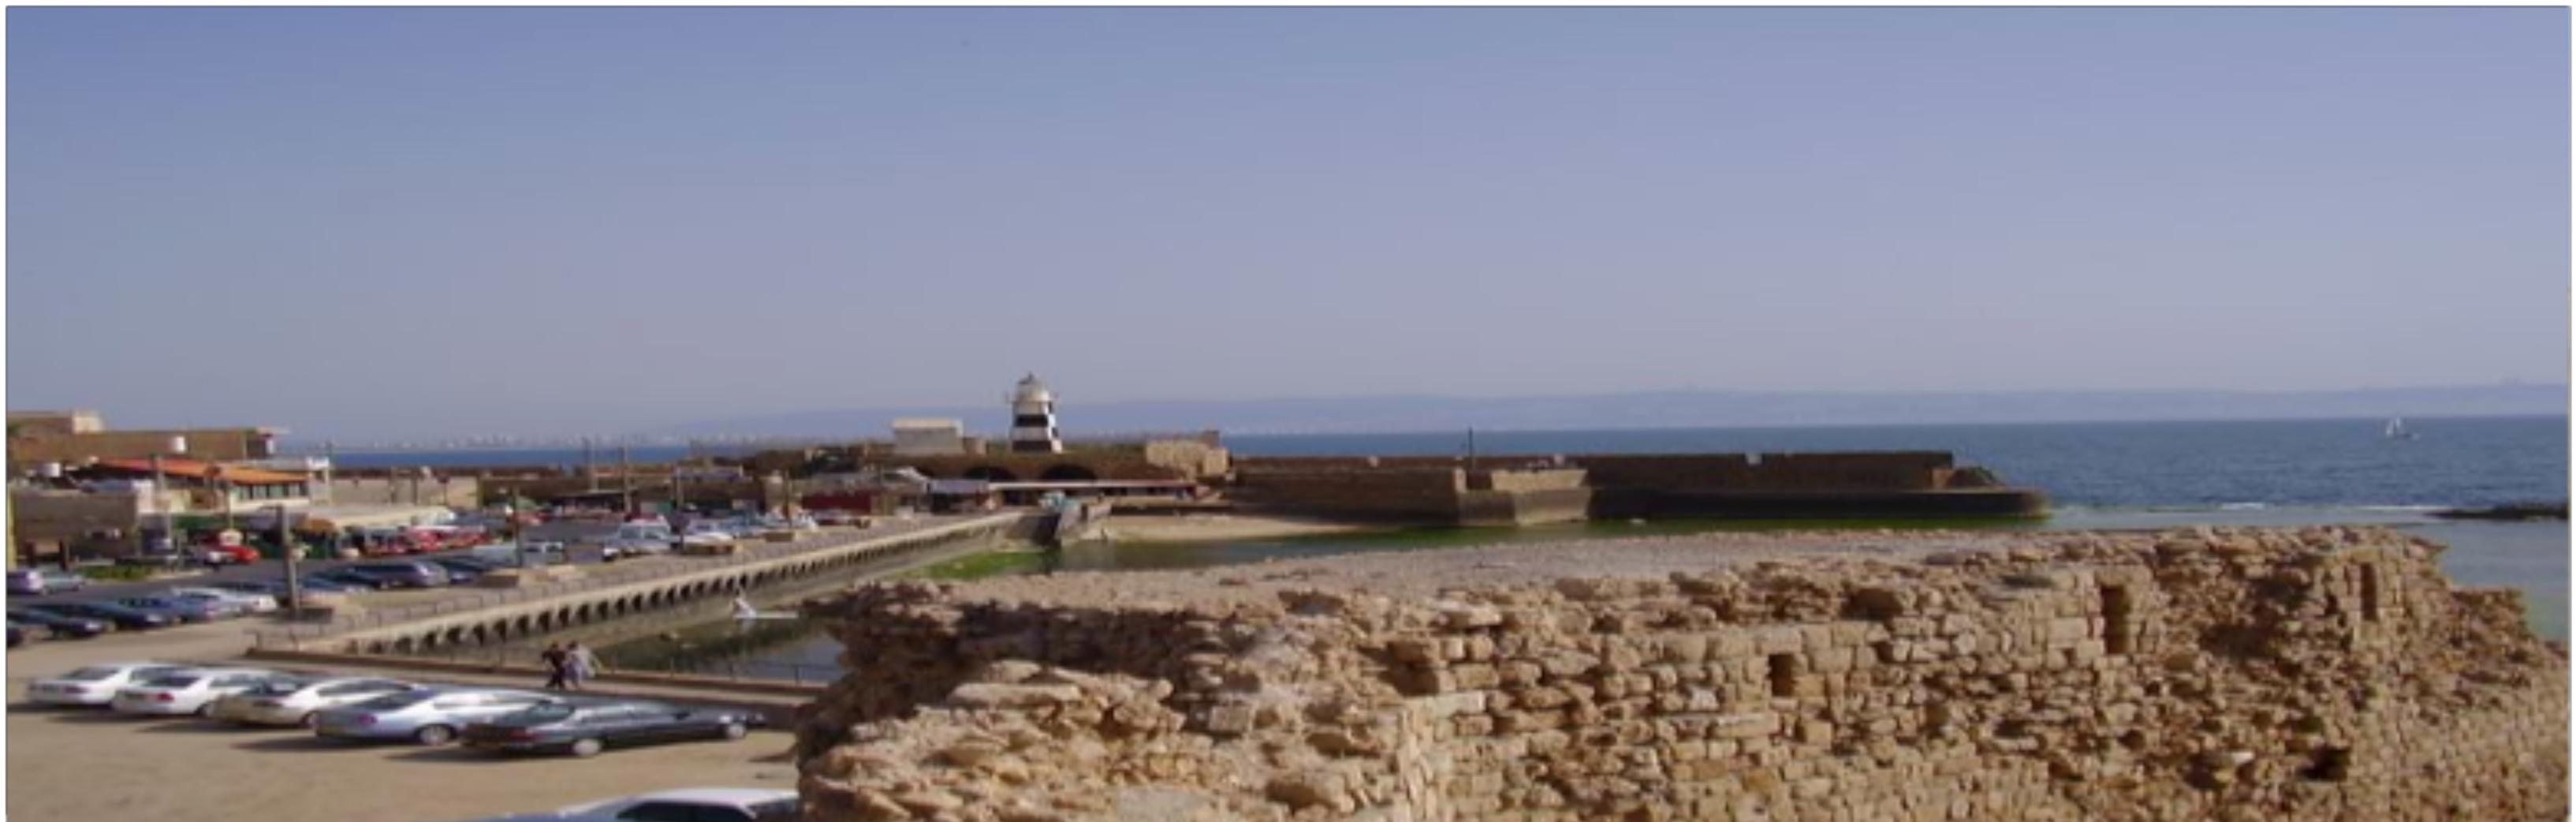 Akko with Haifa and Mt Carmel in background